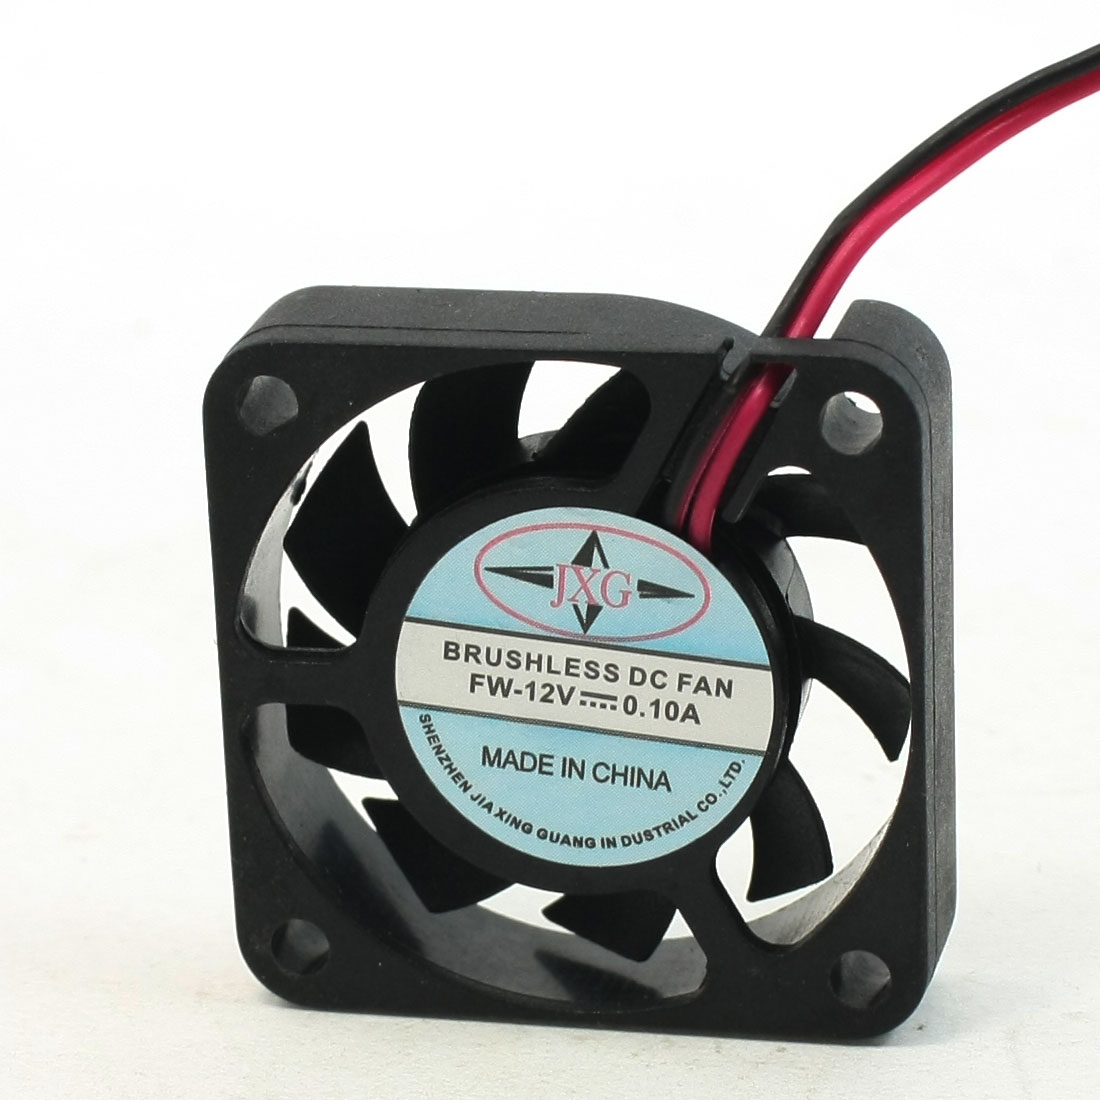 9 Blades 2 Pin Female Terminals PC CPU Computer Case Cooling Fan DC 12V 0.1A